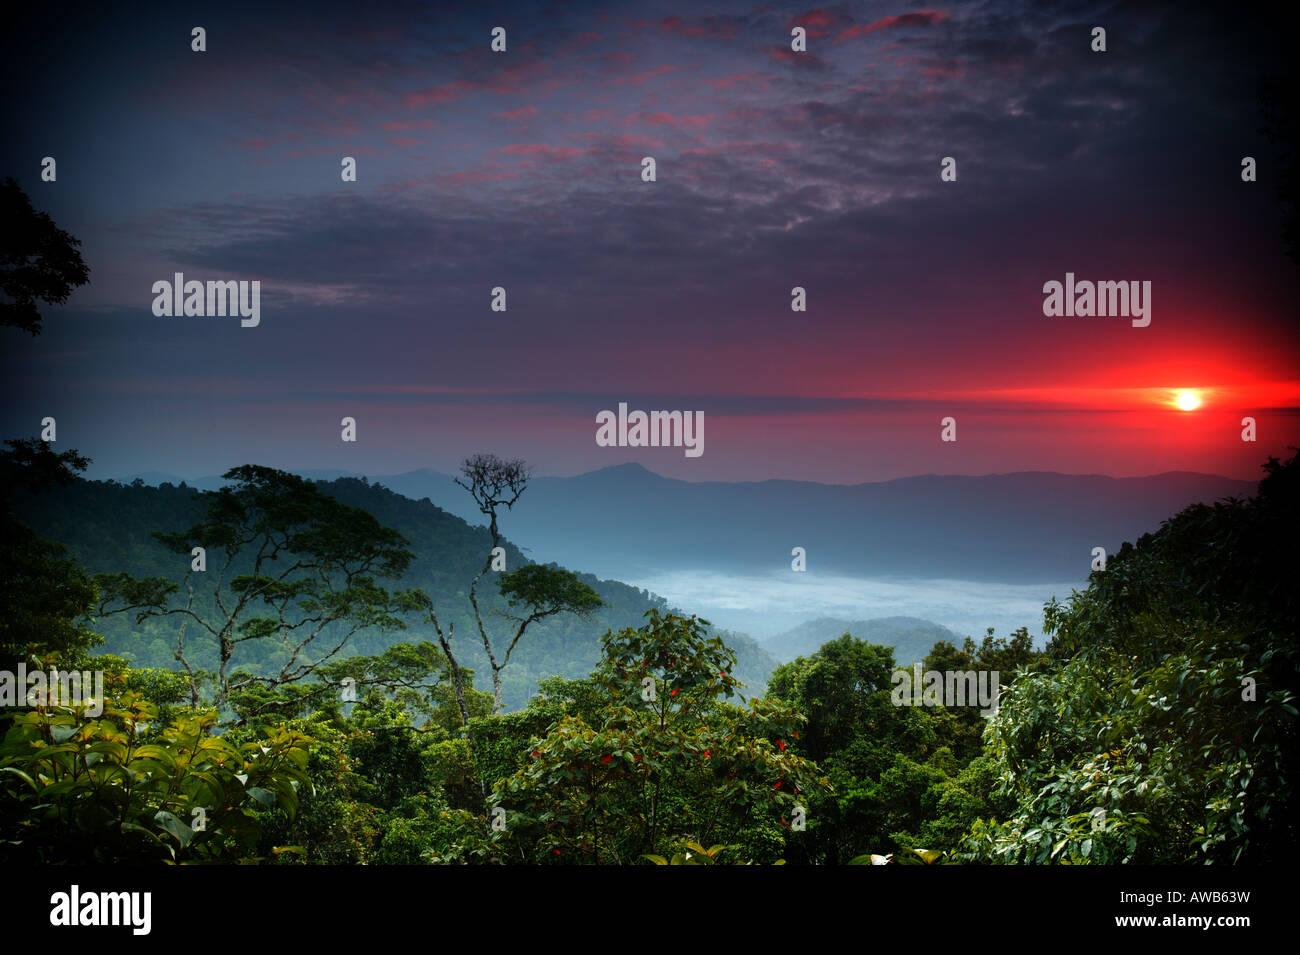 Beautiful sunrise seen from Cerro Pirre in Darien national park, Darien province, Republic of Panama. Stock Photo